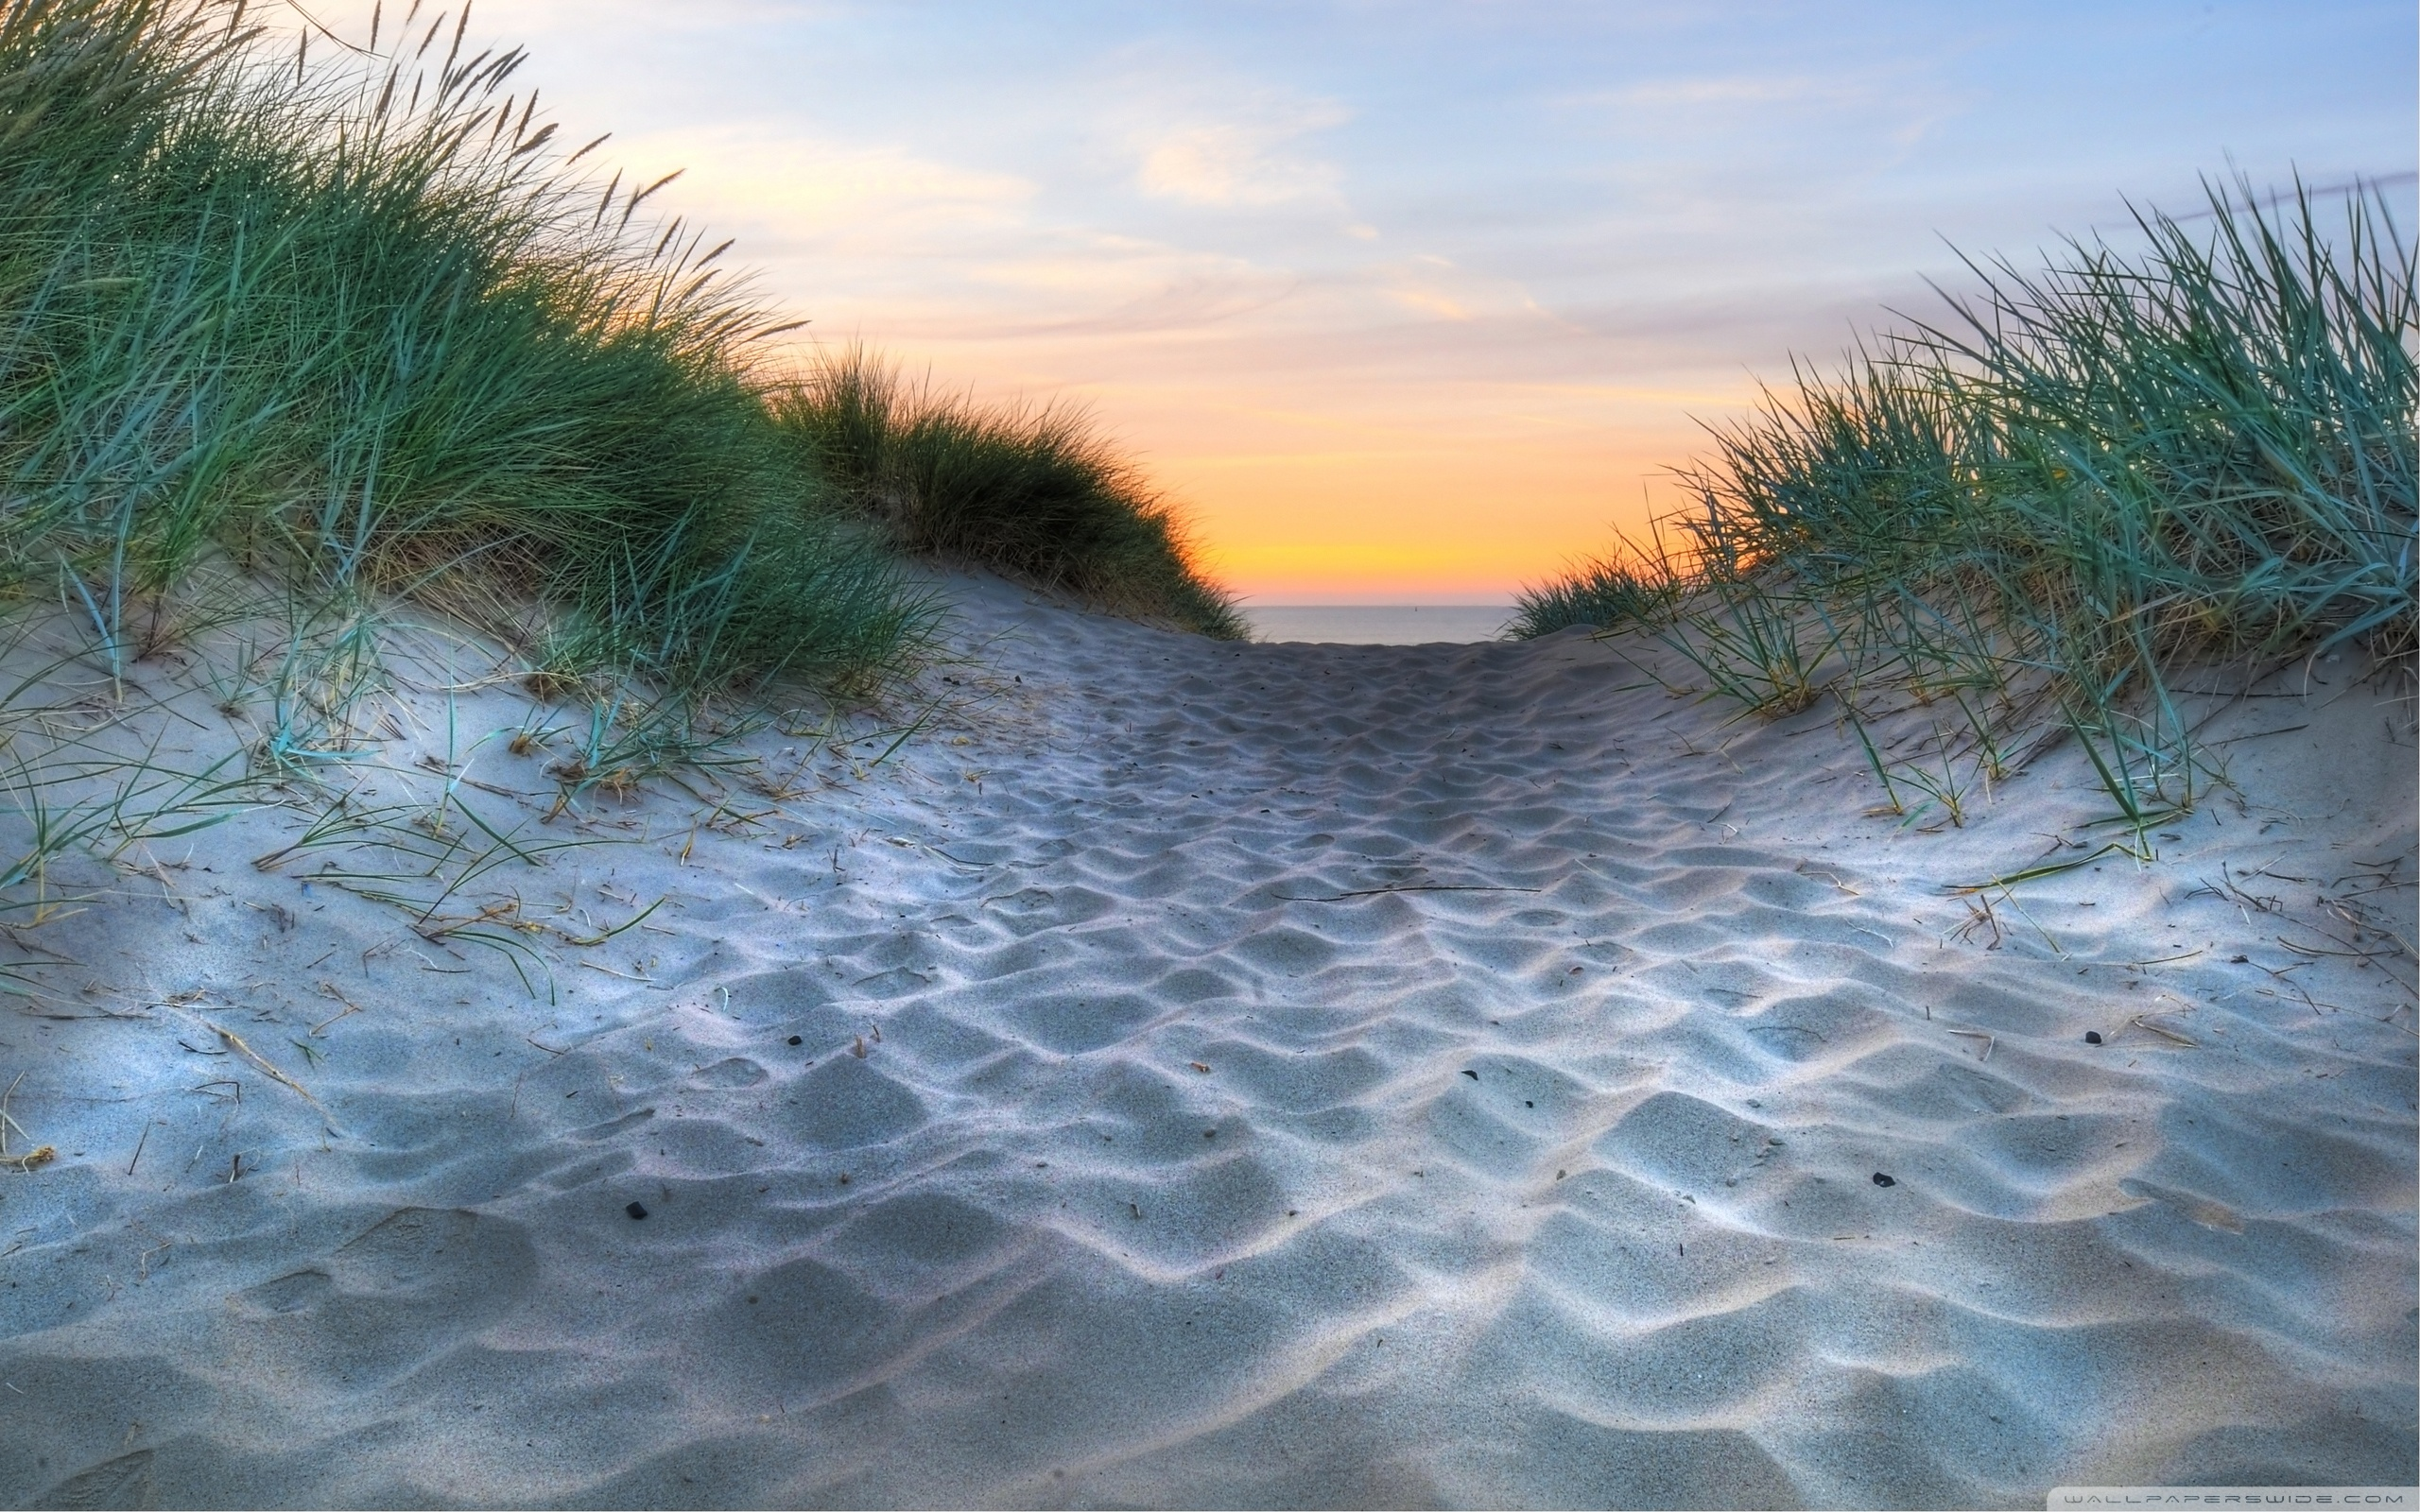 Beach Vegetation 4K HD Desktop Wallpaper for Dual Monitor 2560x1600